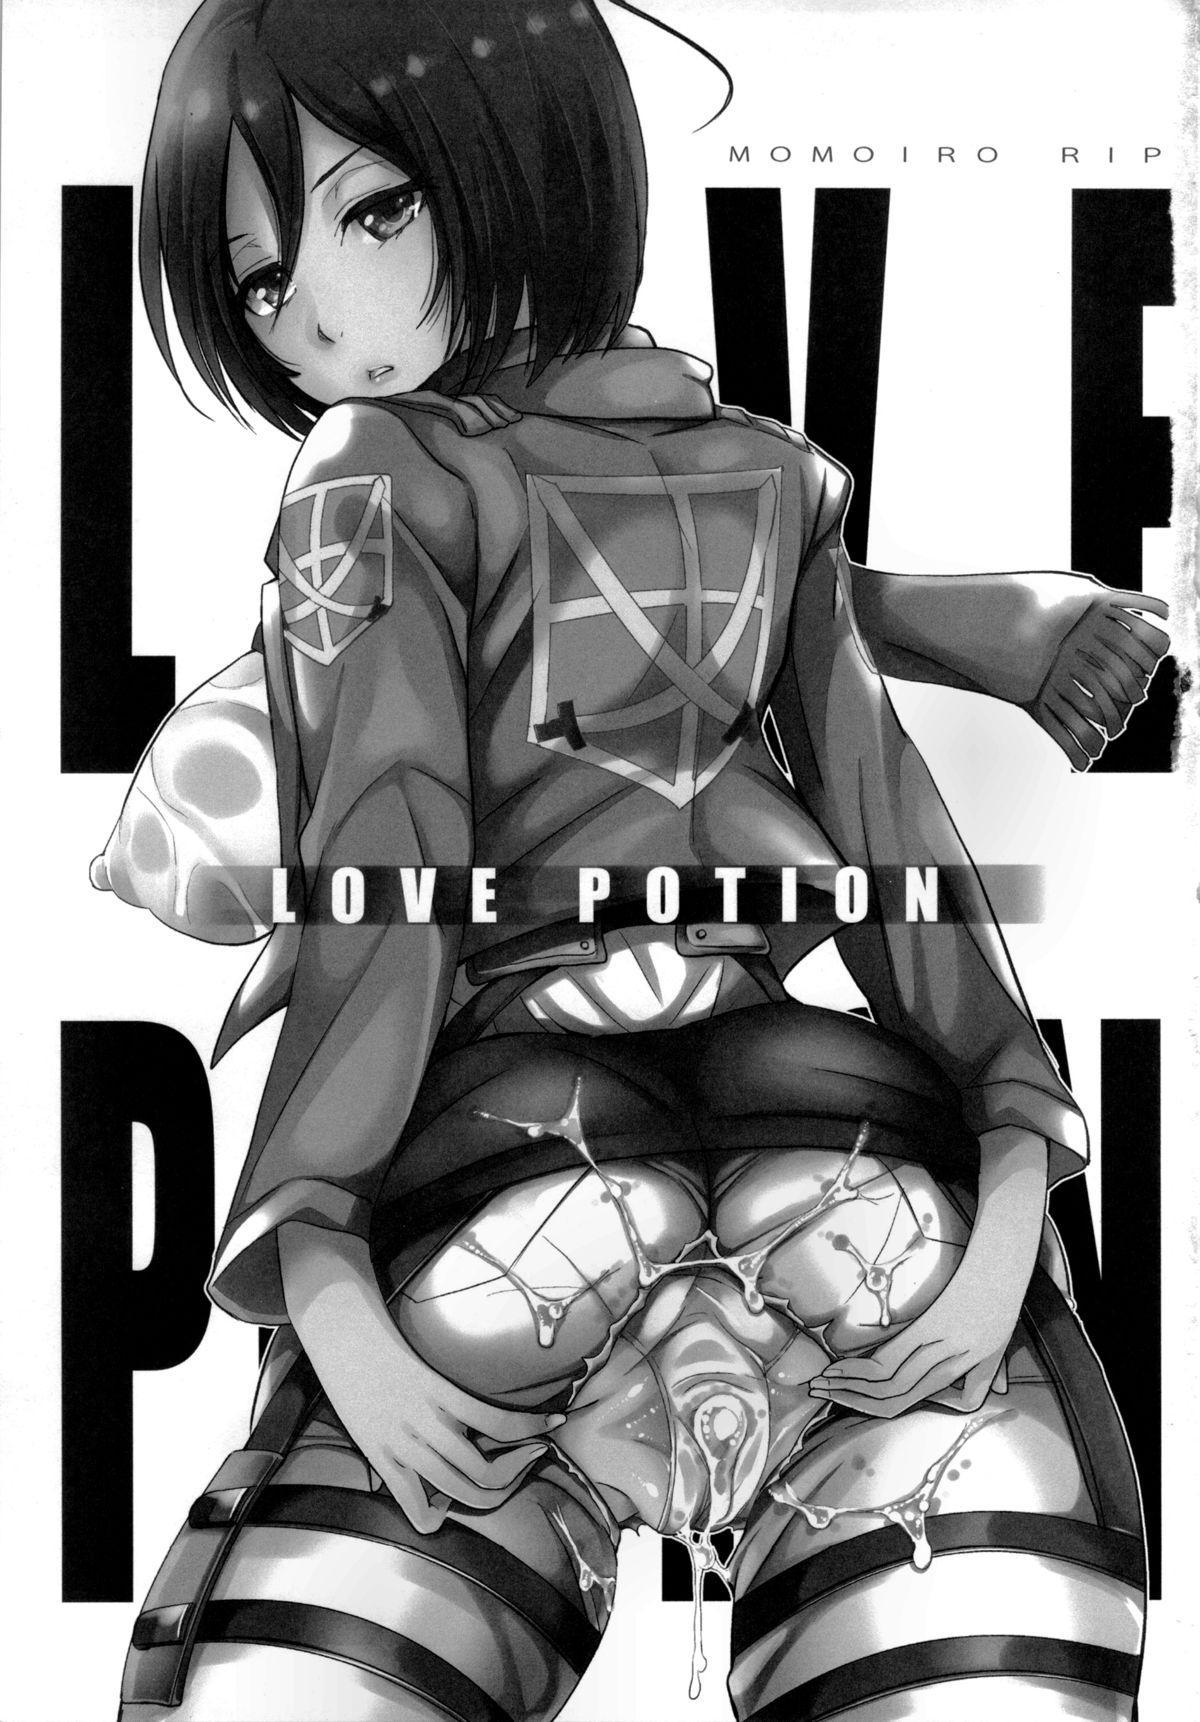 Love Potion 1